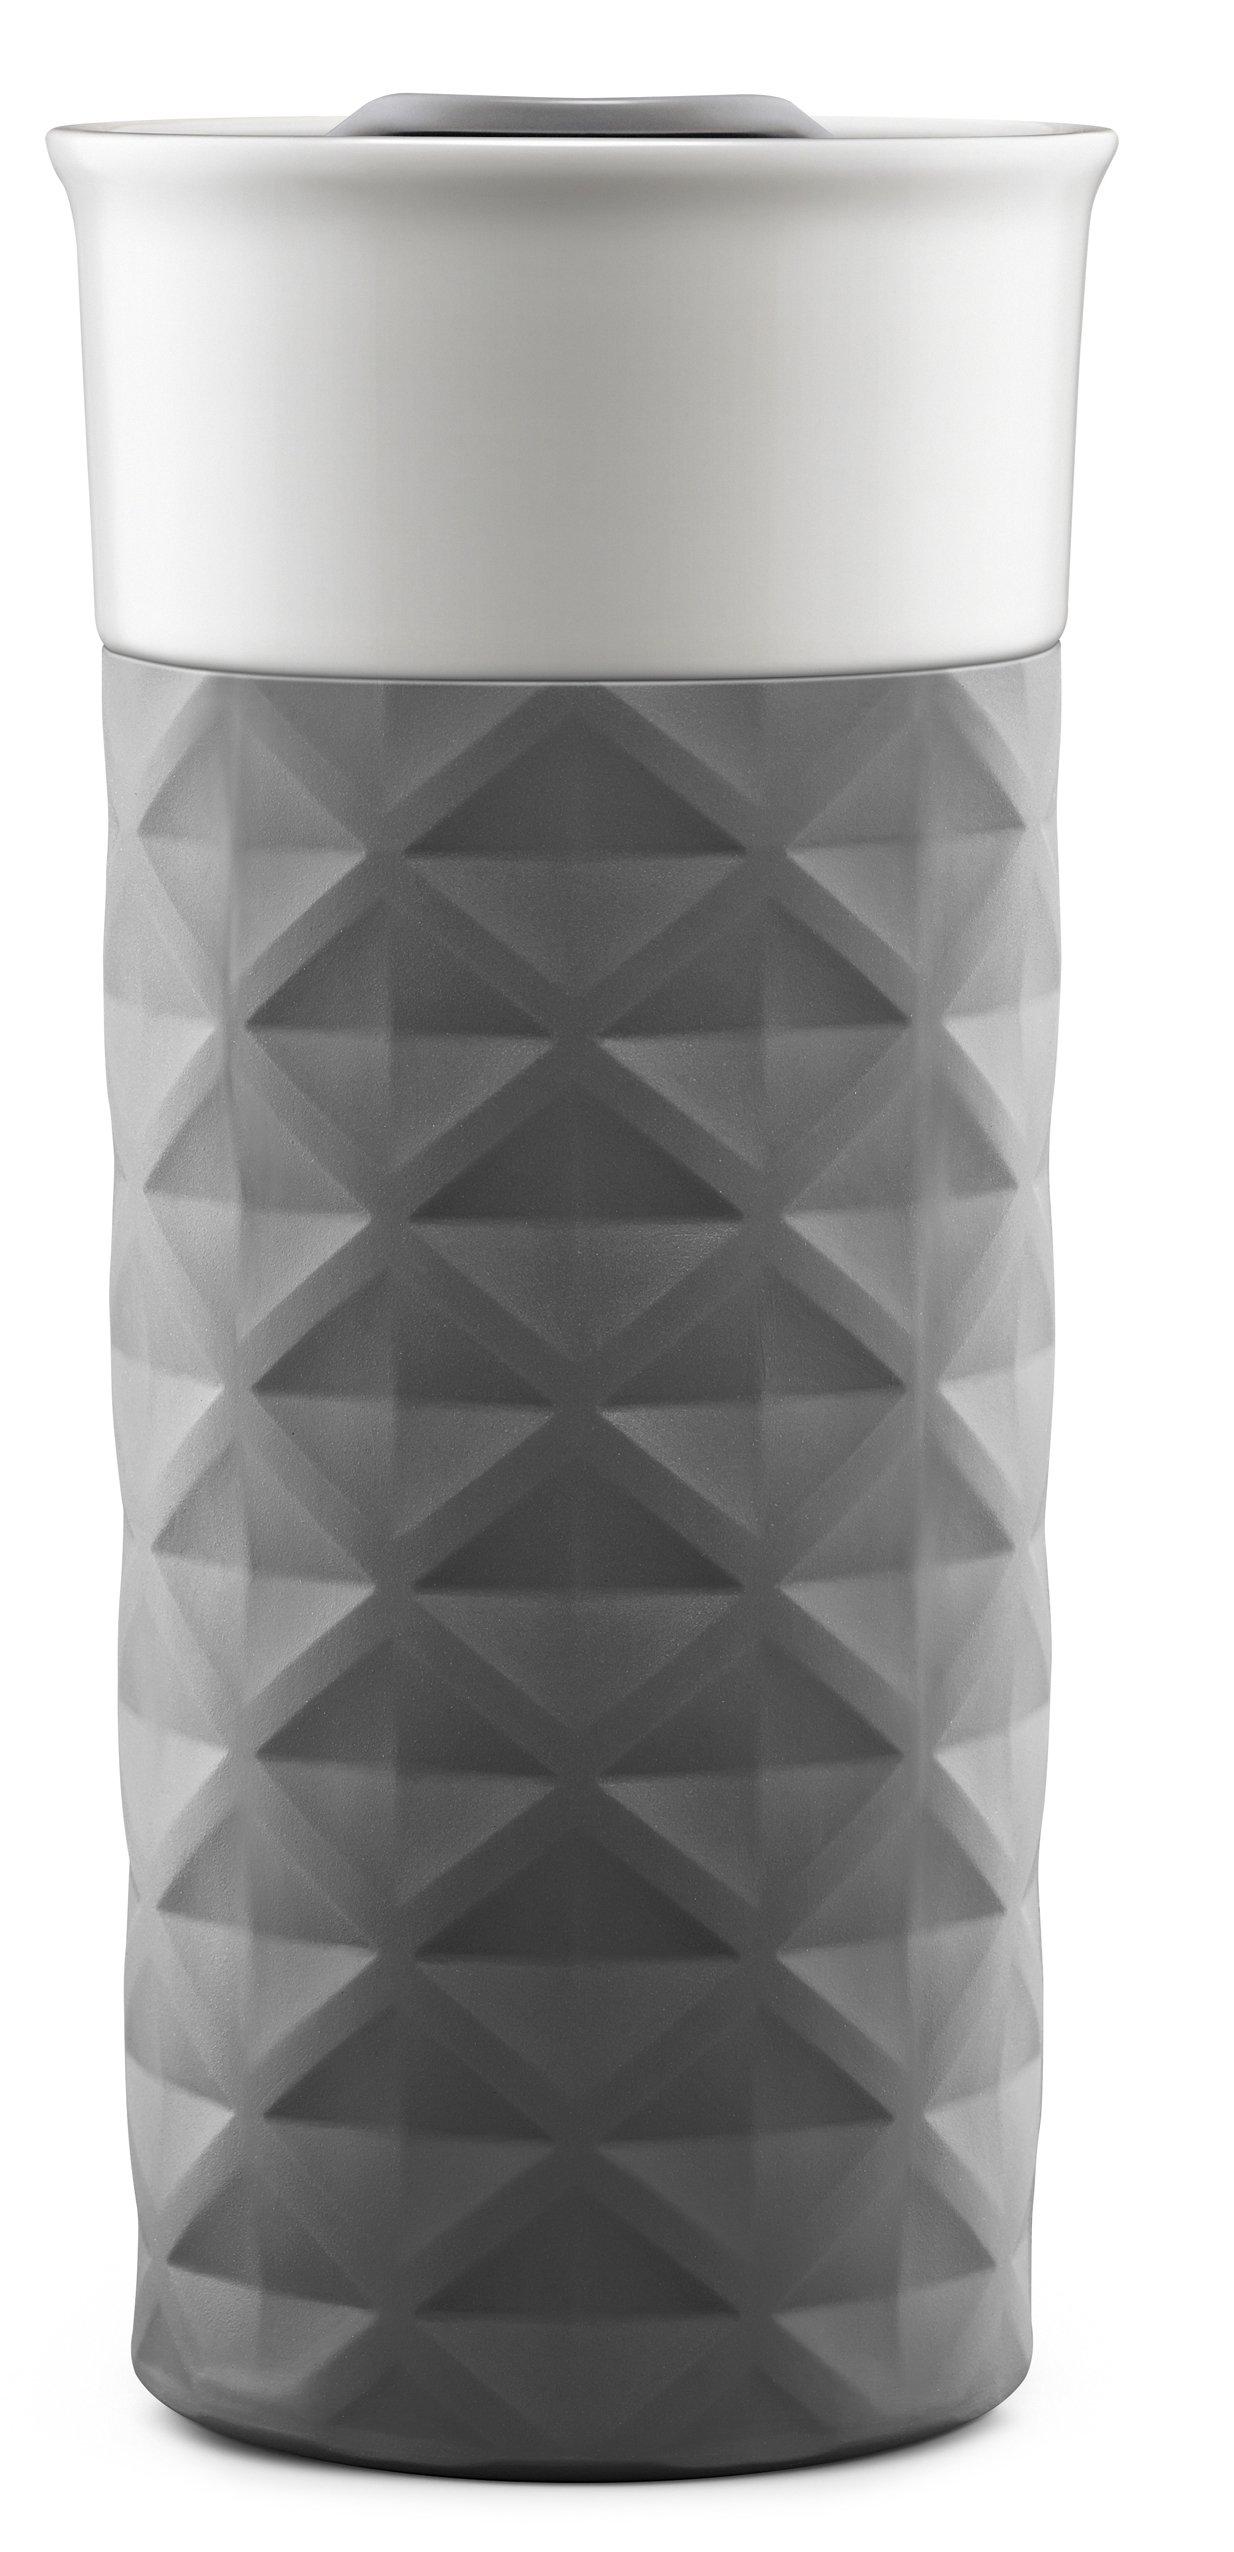 Ello Ogden BPA-Free Ceramic Travel Mug with Lid, Grey, 16 oz by Ello (Image #5)